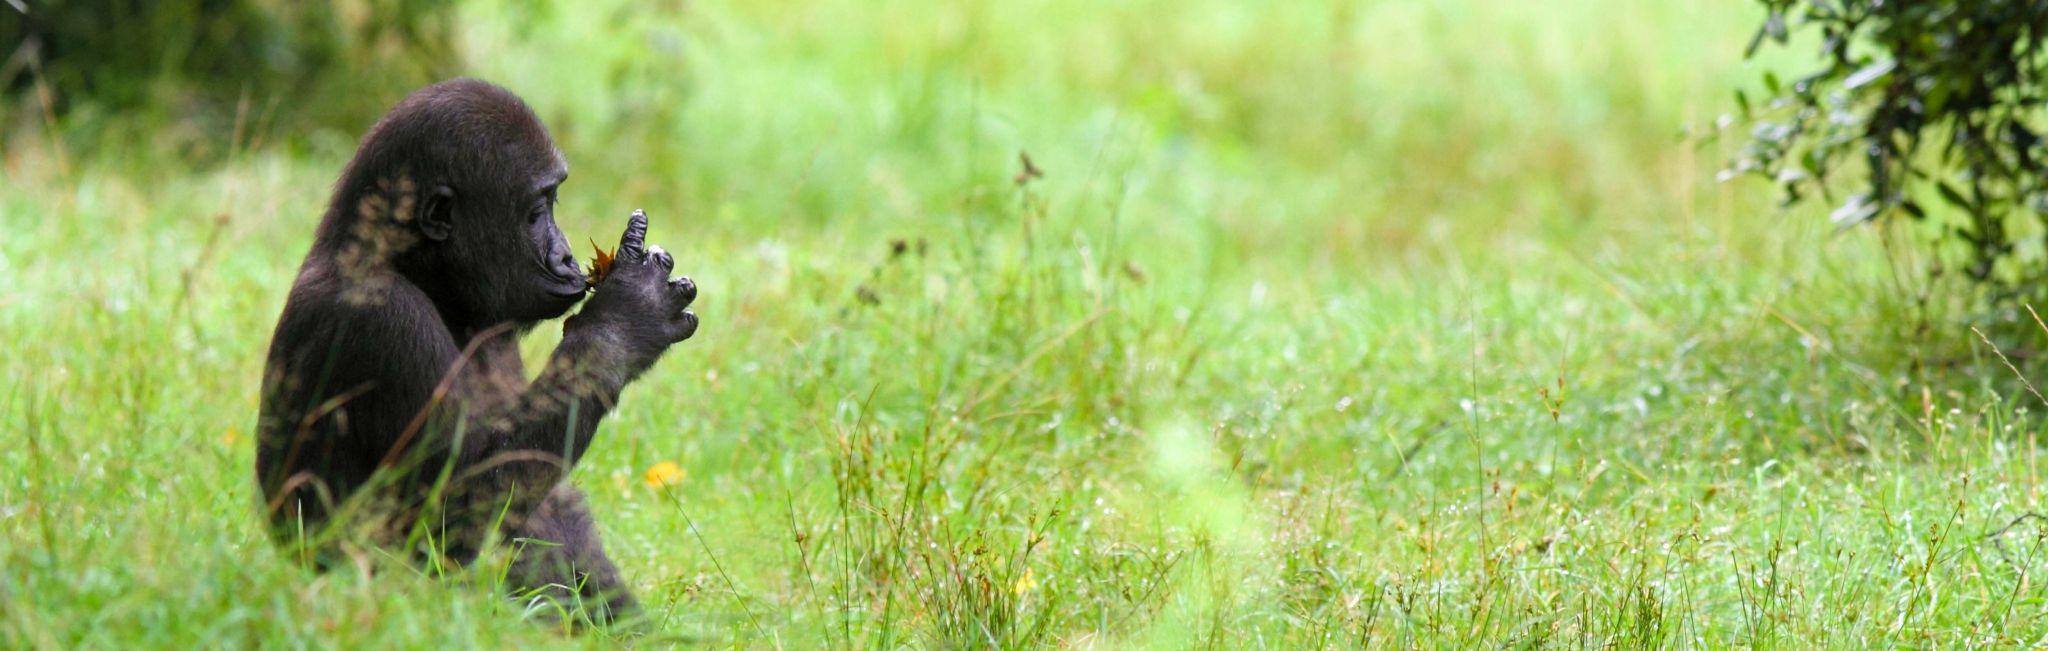 An endangered gorilla sits in the grass in Rwanda.